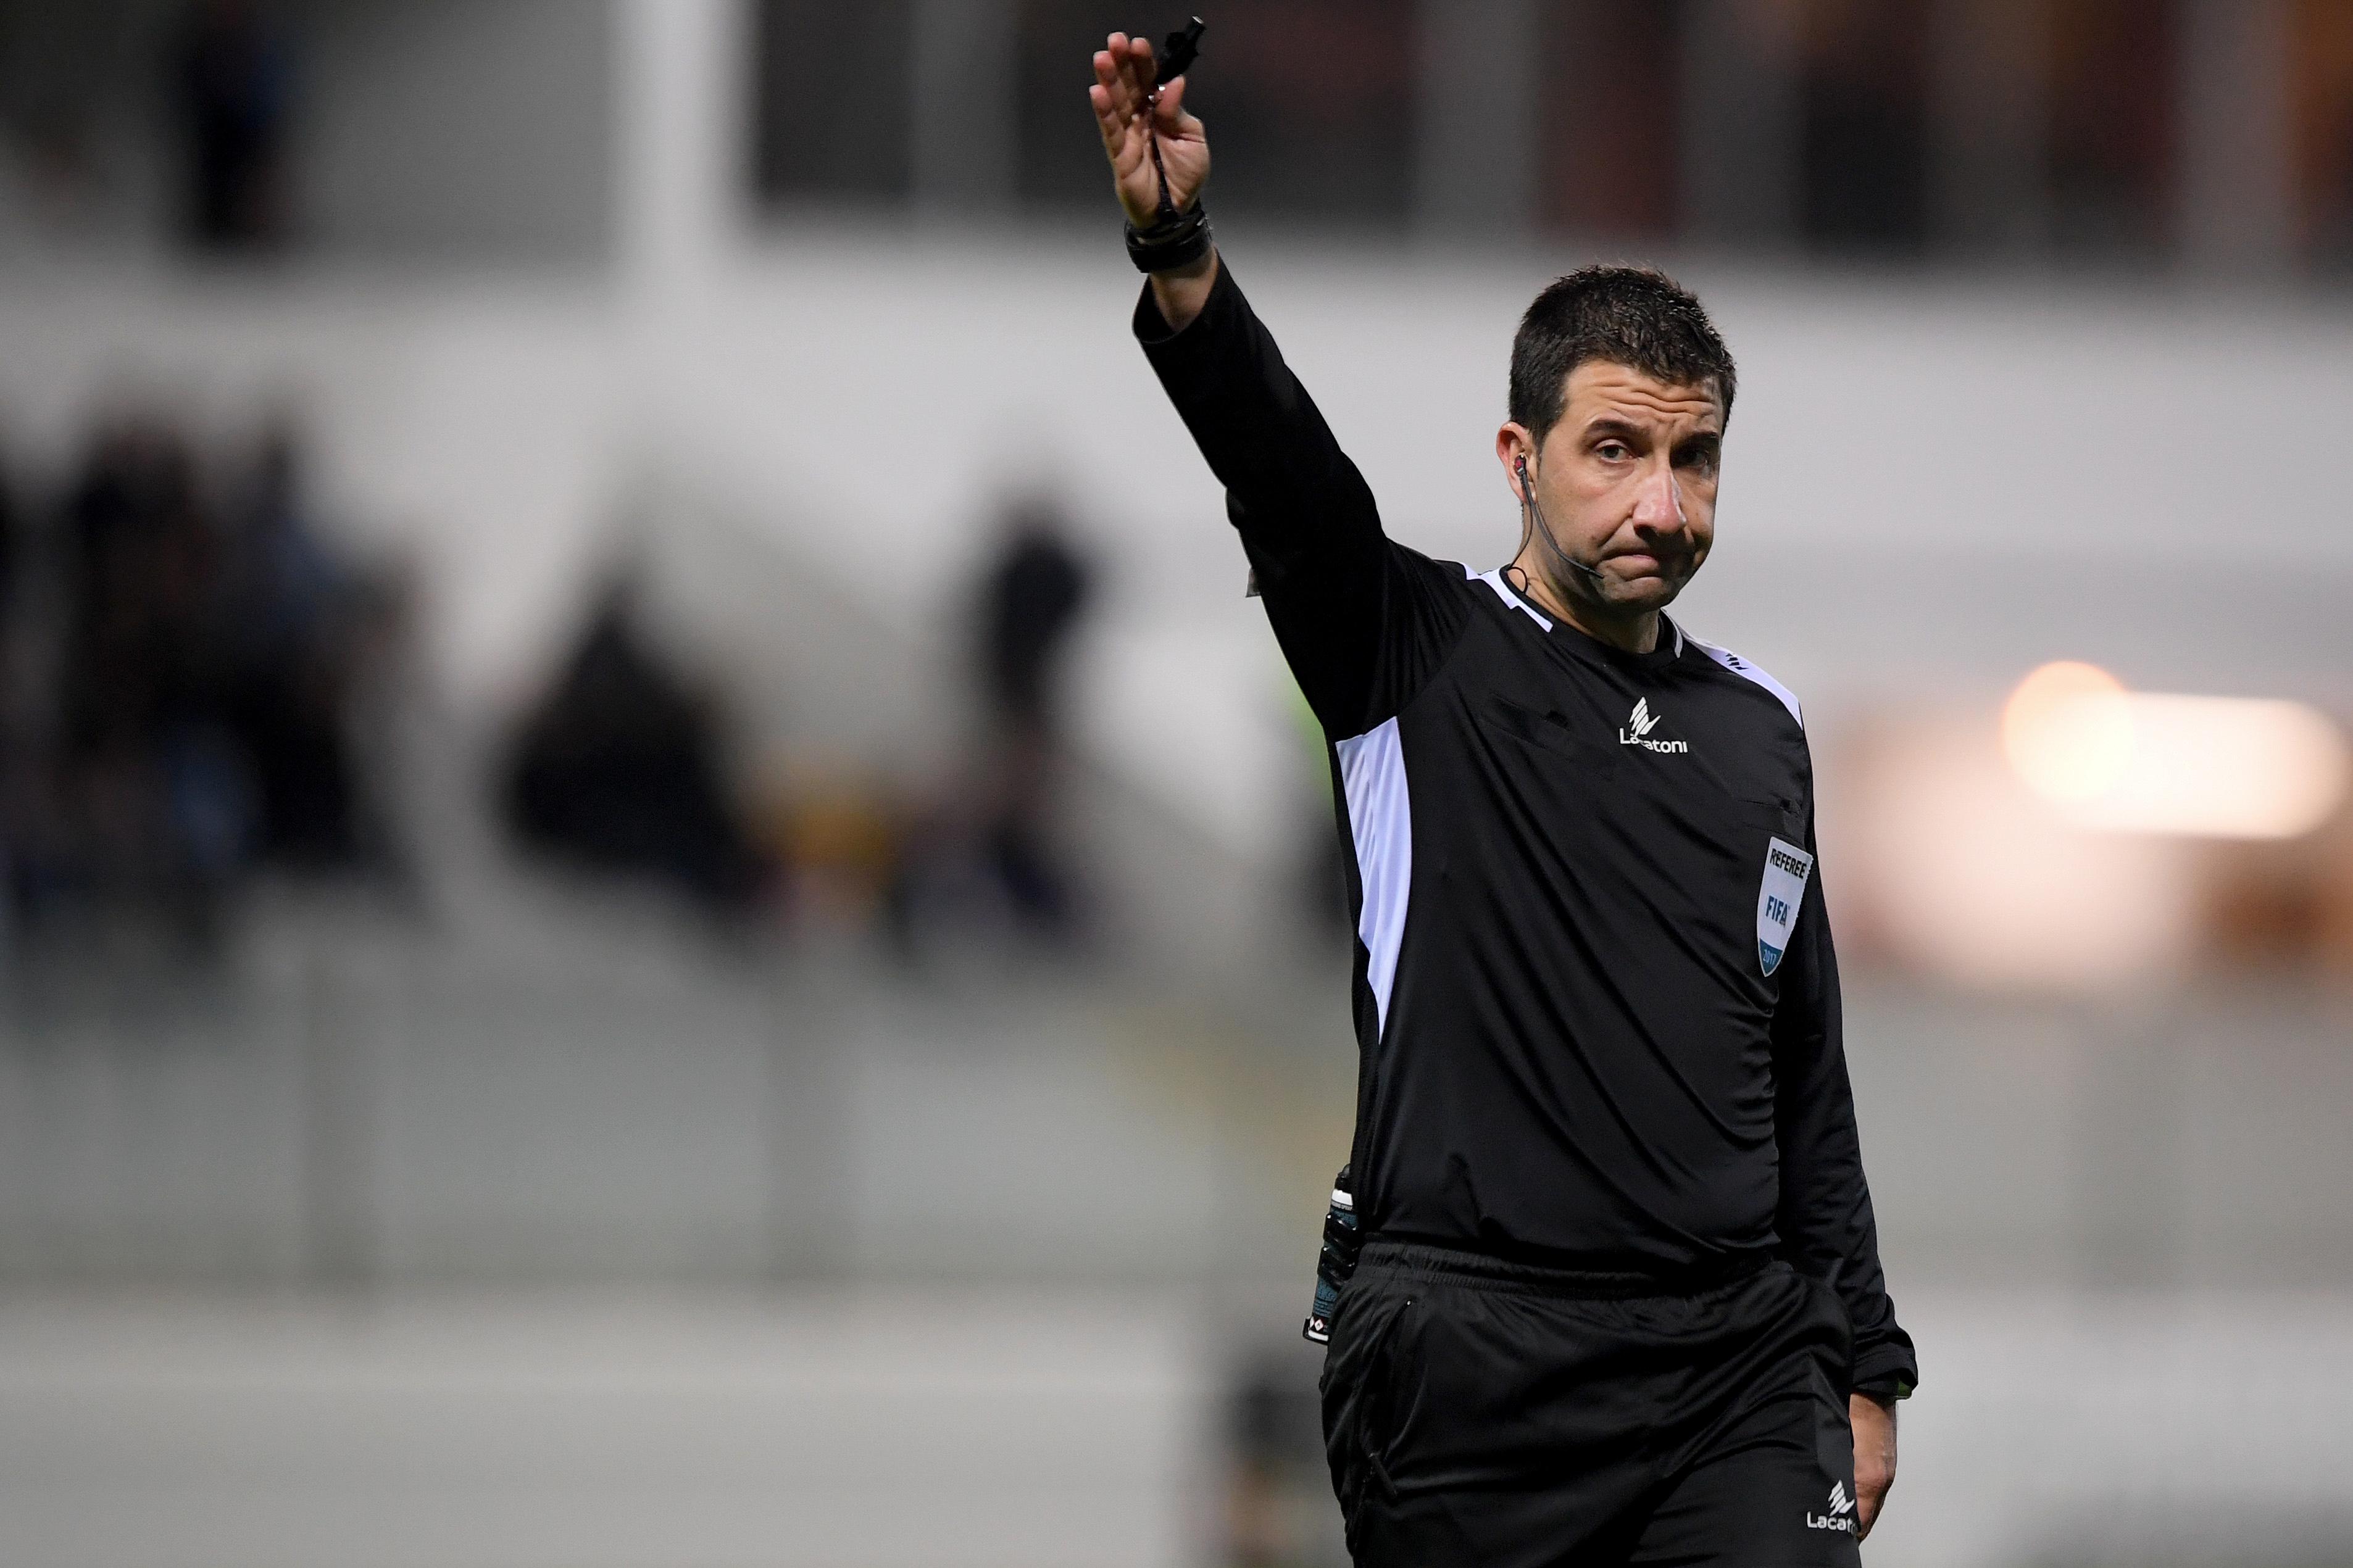 Hugo Miguel dirige Estoril -Benfica. Gonçalo Martins é o VAR